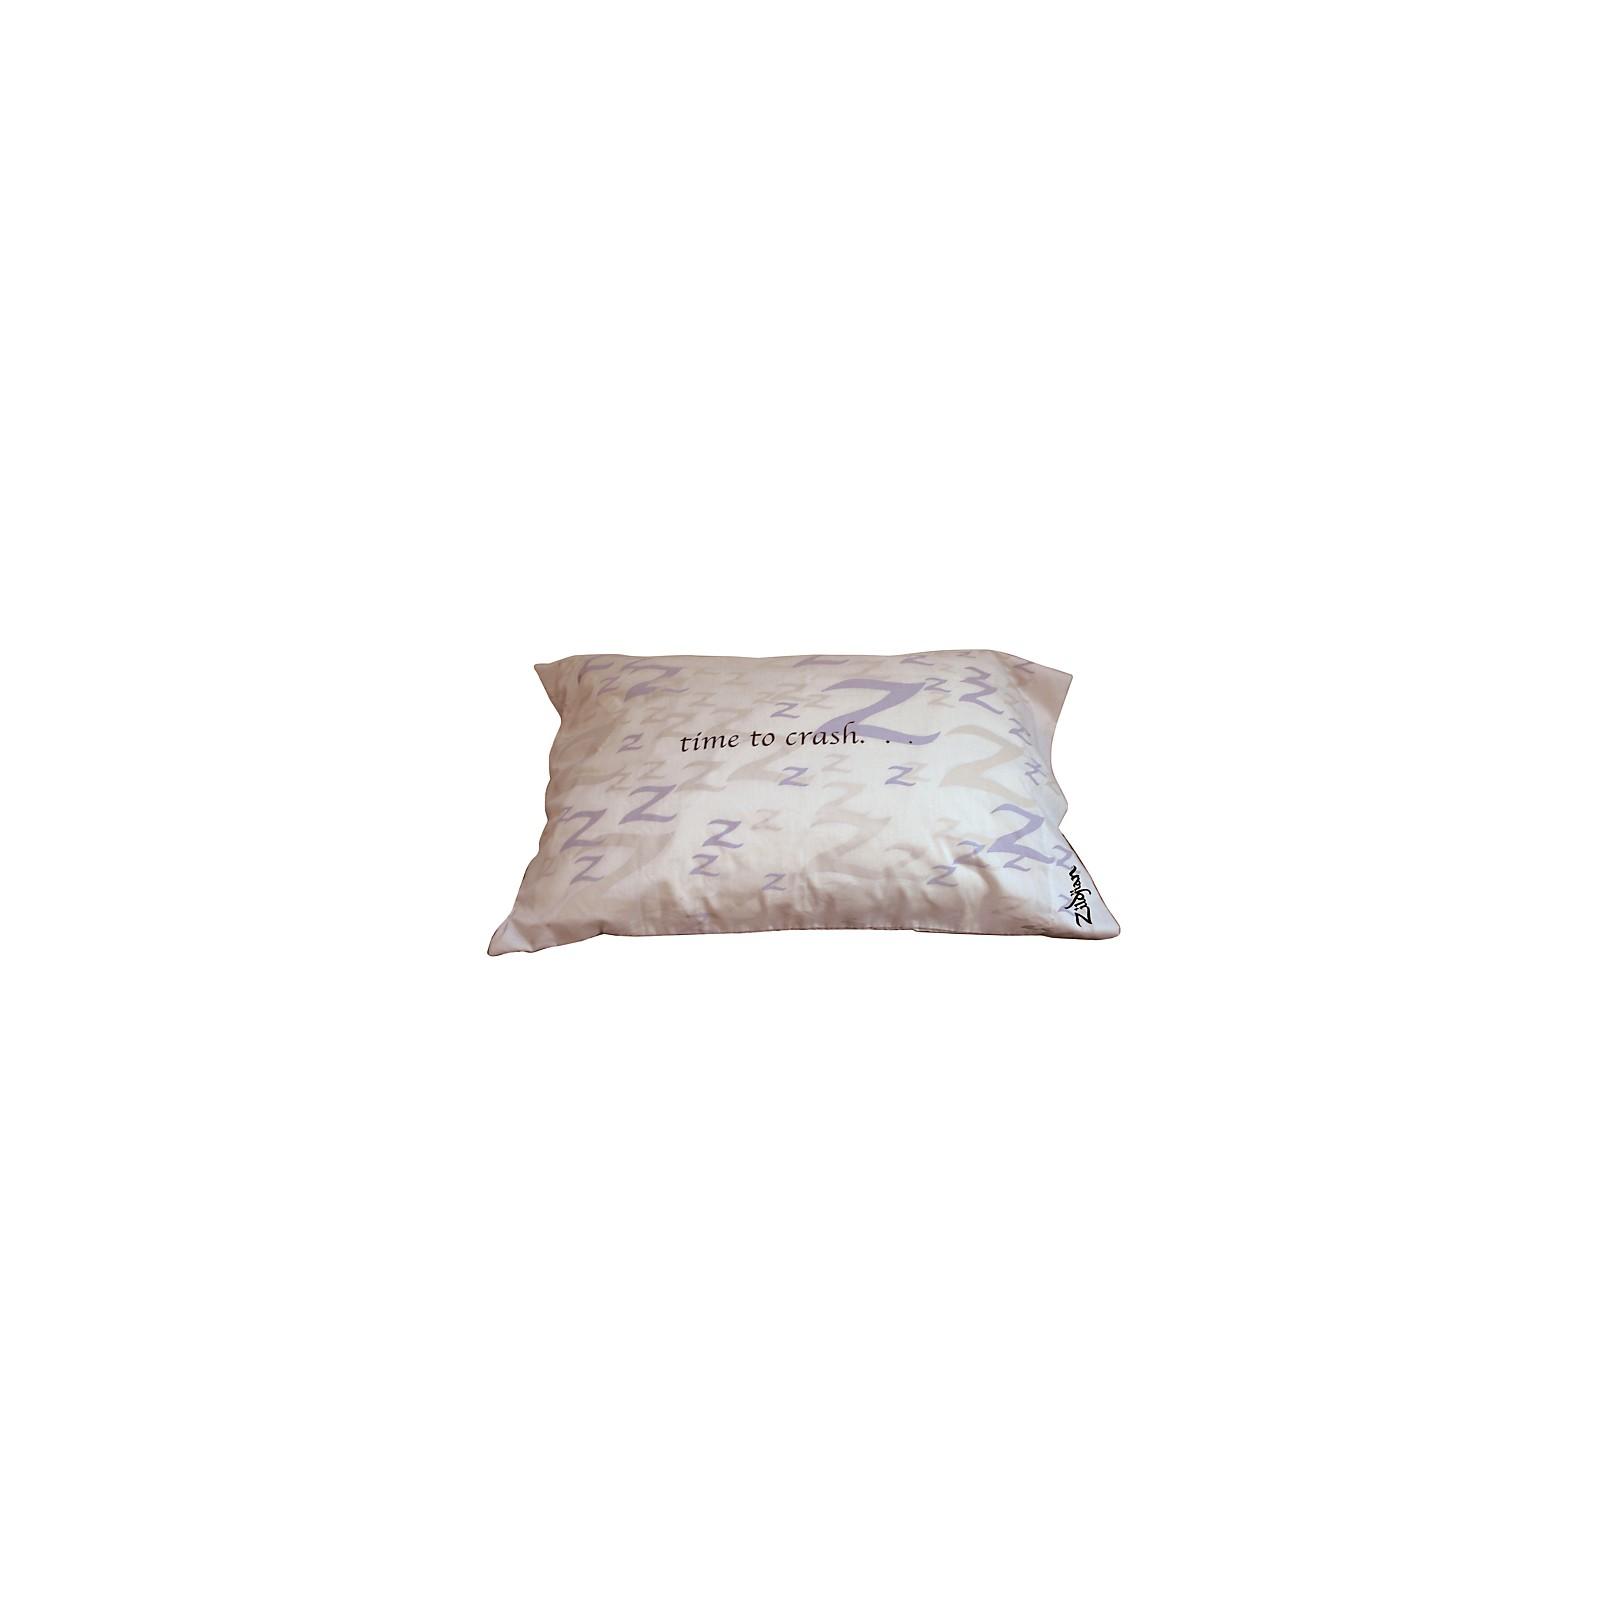 Zildjian Pillowcase